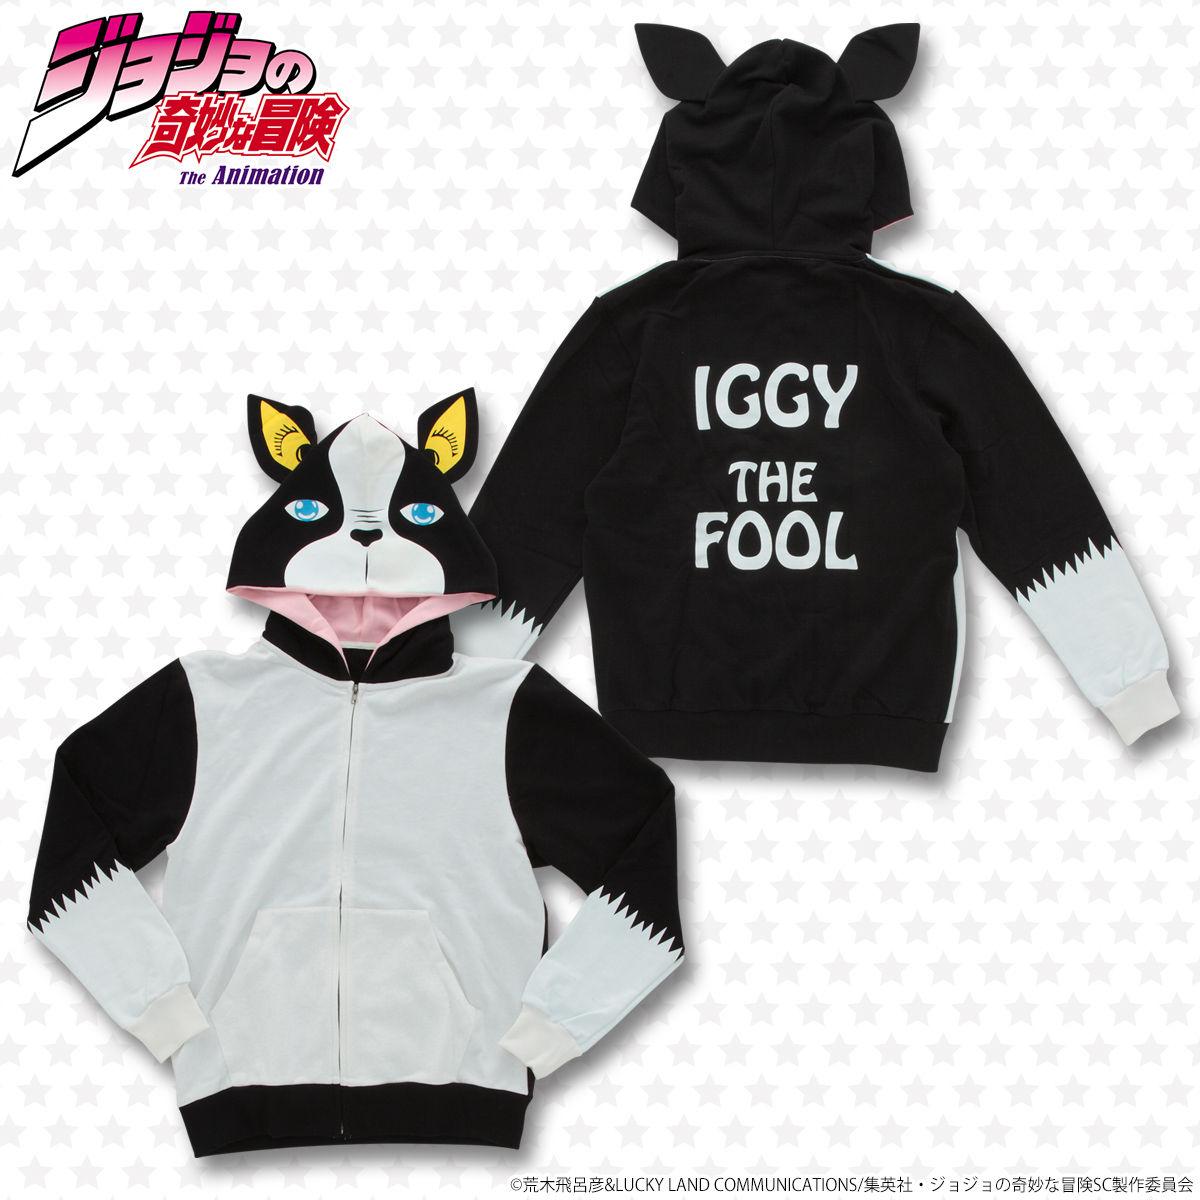 JoJo's Bizarre Adventure Iggy-themed Hoodie And Sweatpants